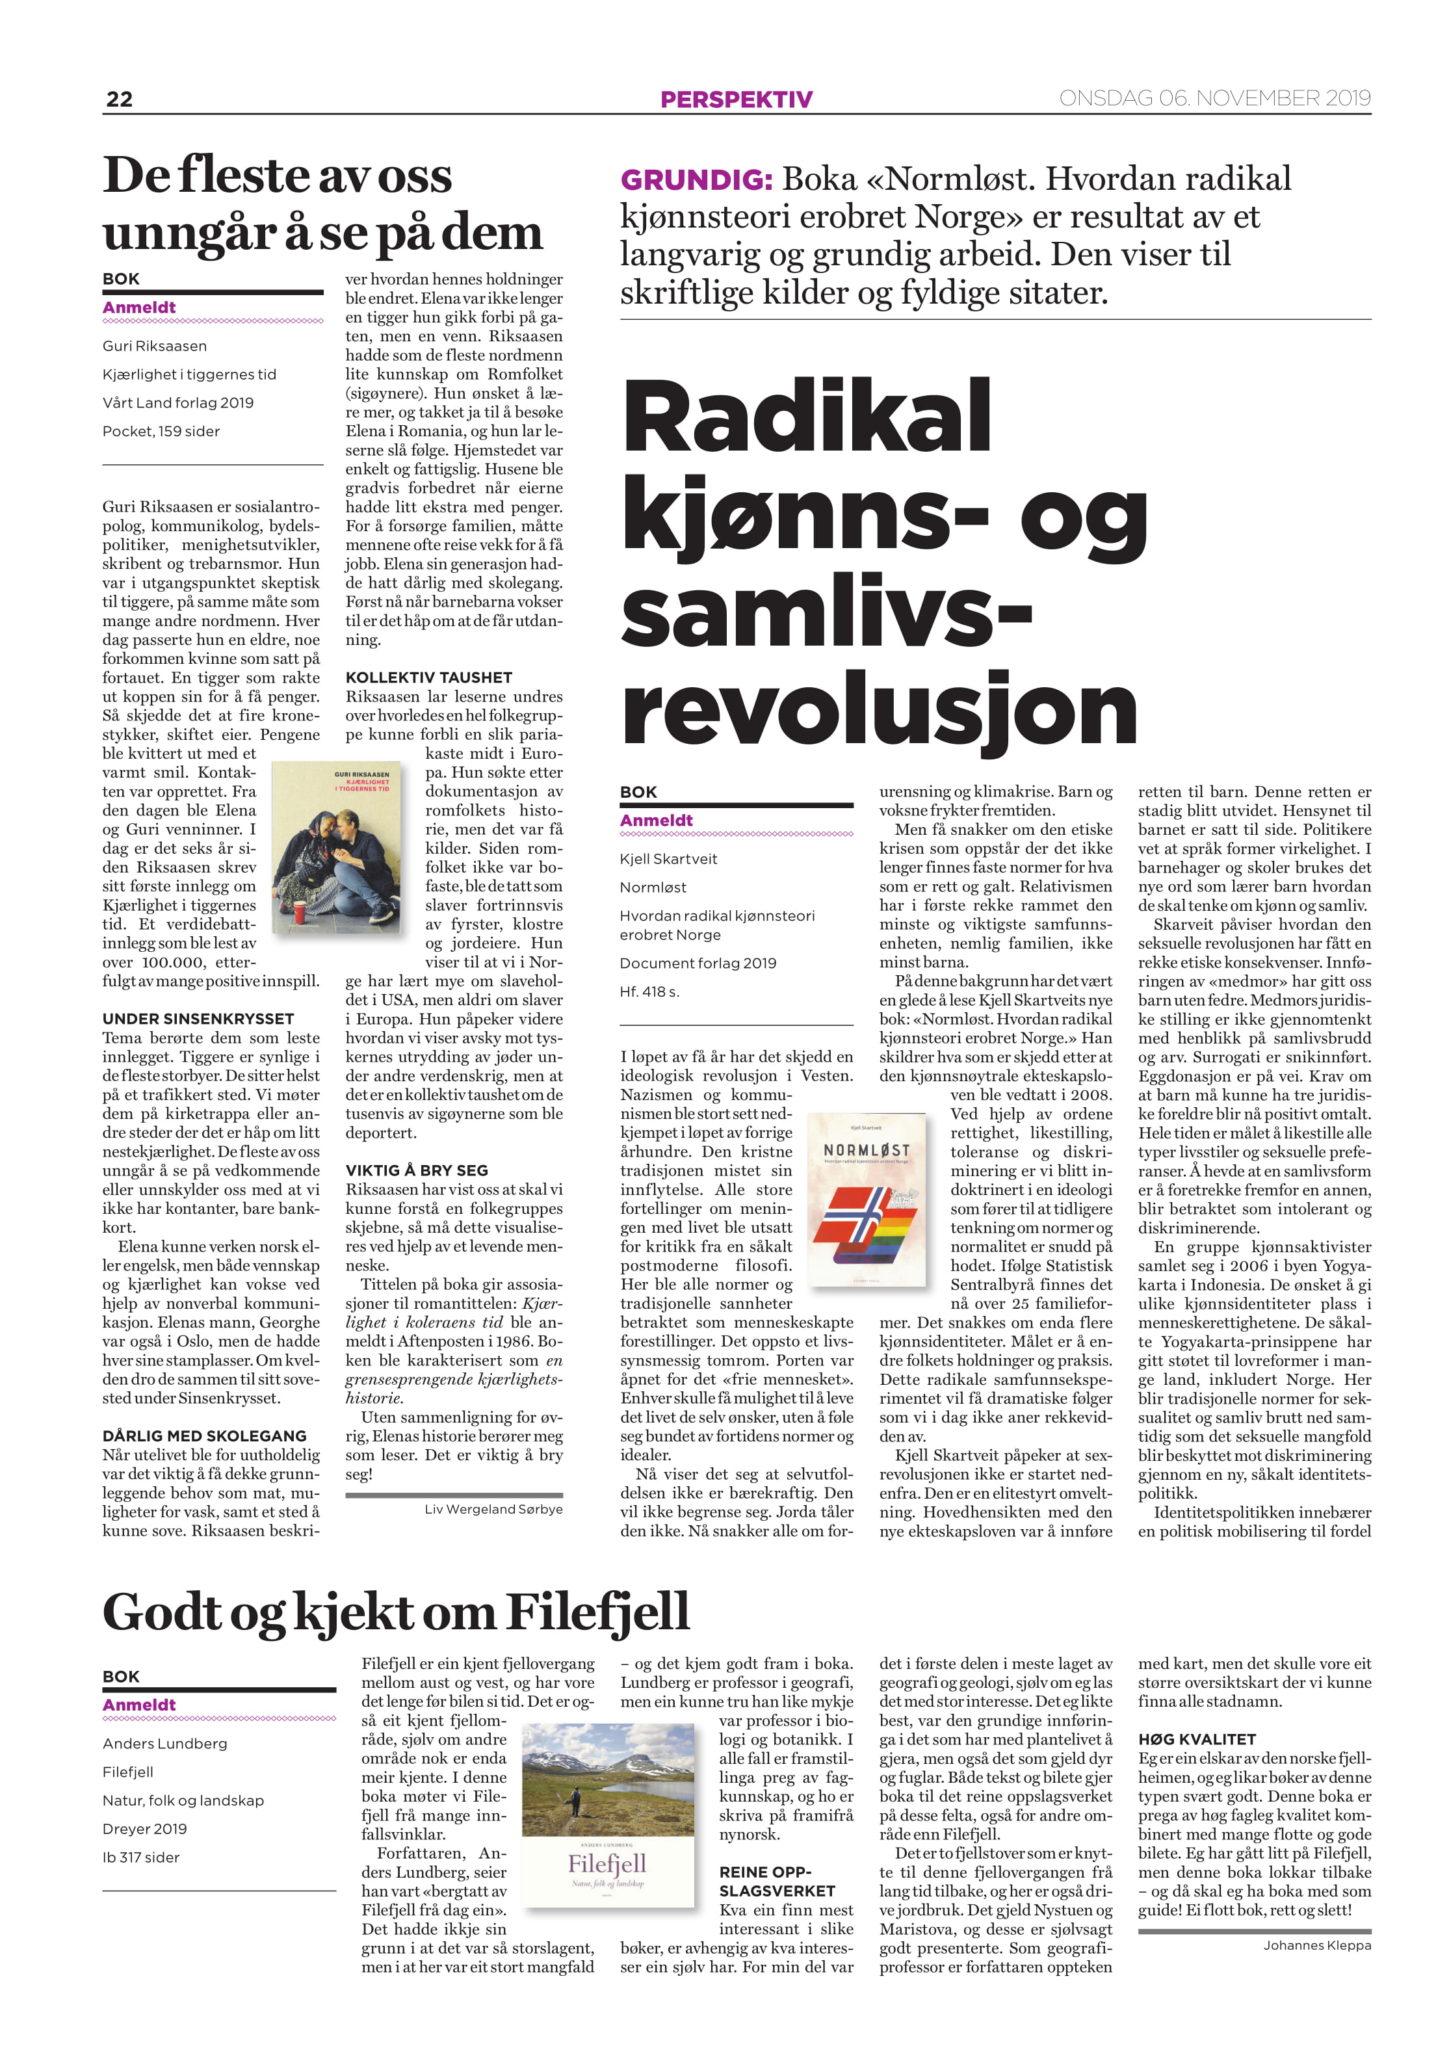 Normløst anmeldt i Dagen, side 22